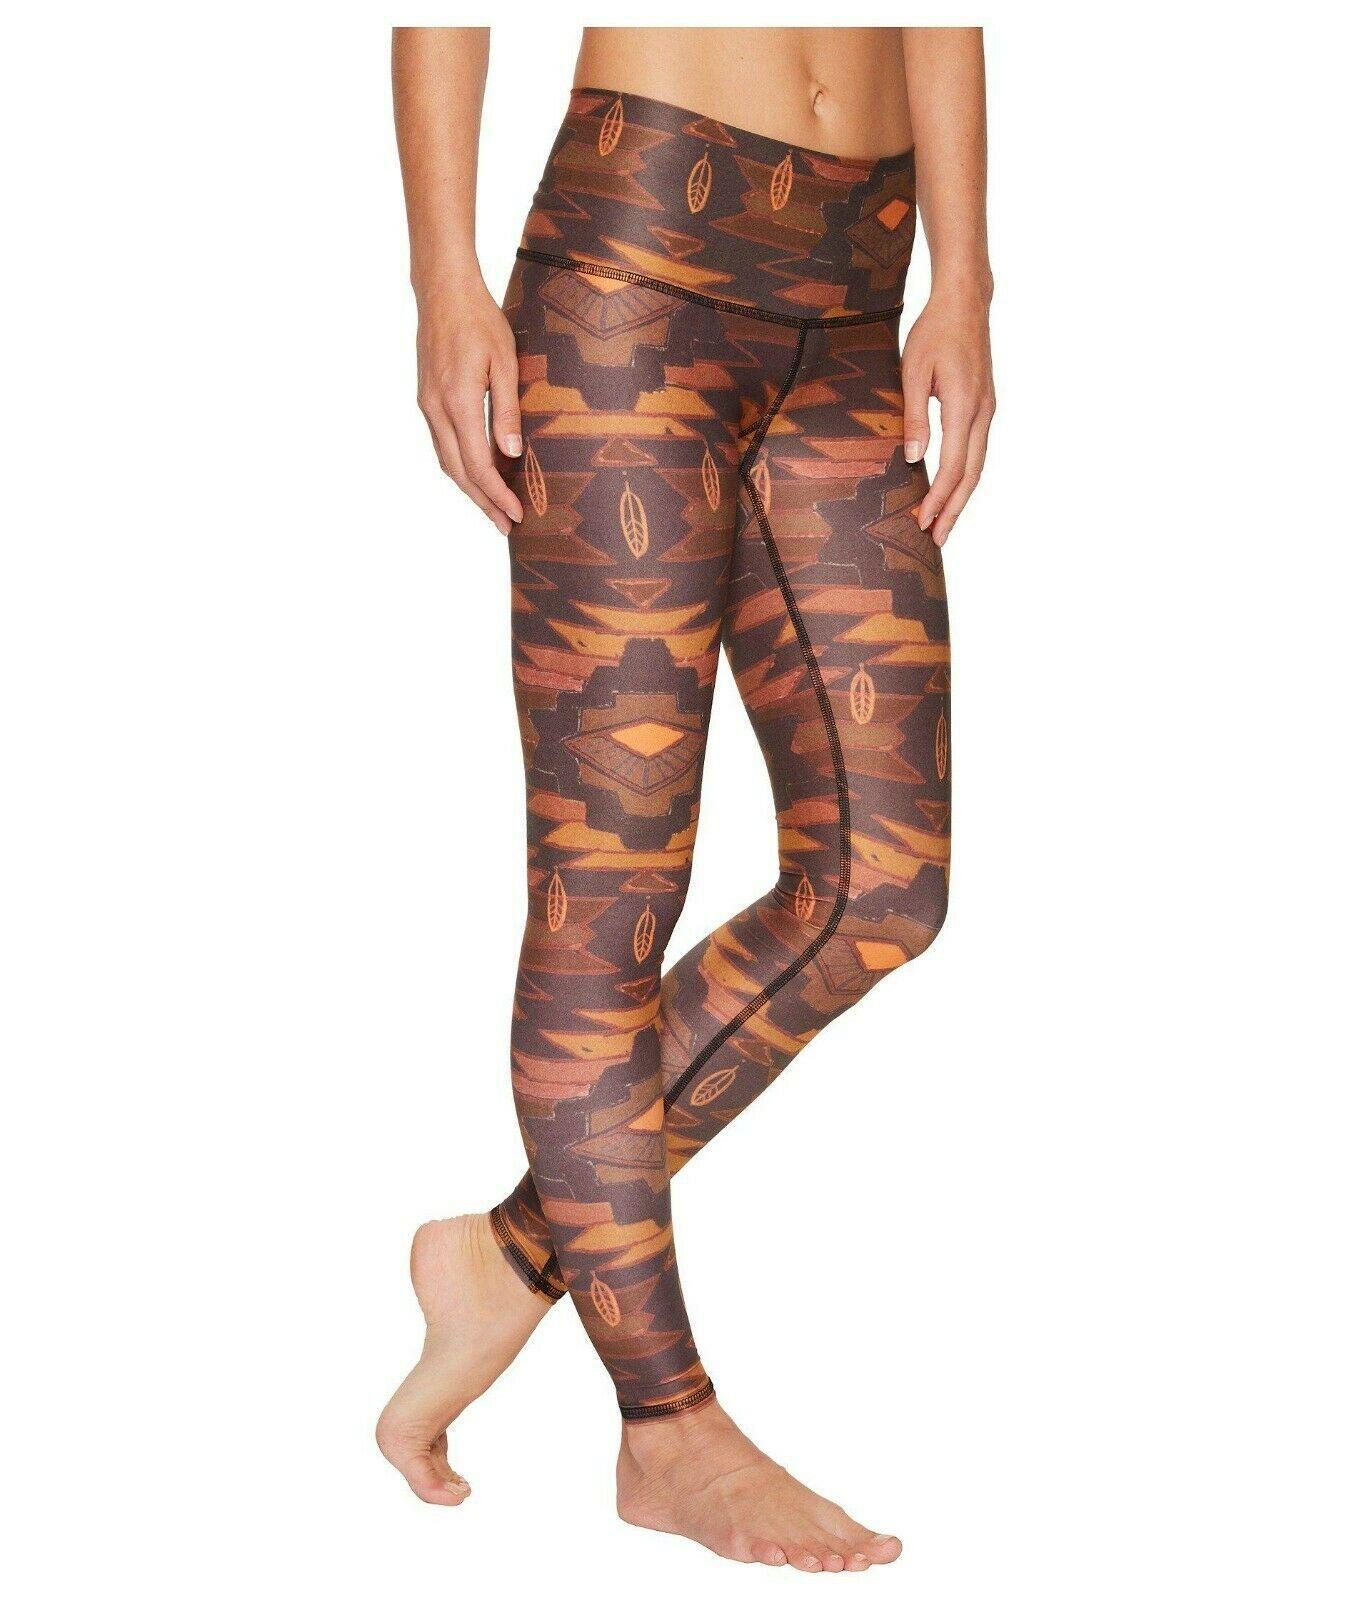 Teeki Mujer Leggings Mediano Pantalones Cortos Pantalones Southern Cross Pilates image 2